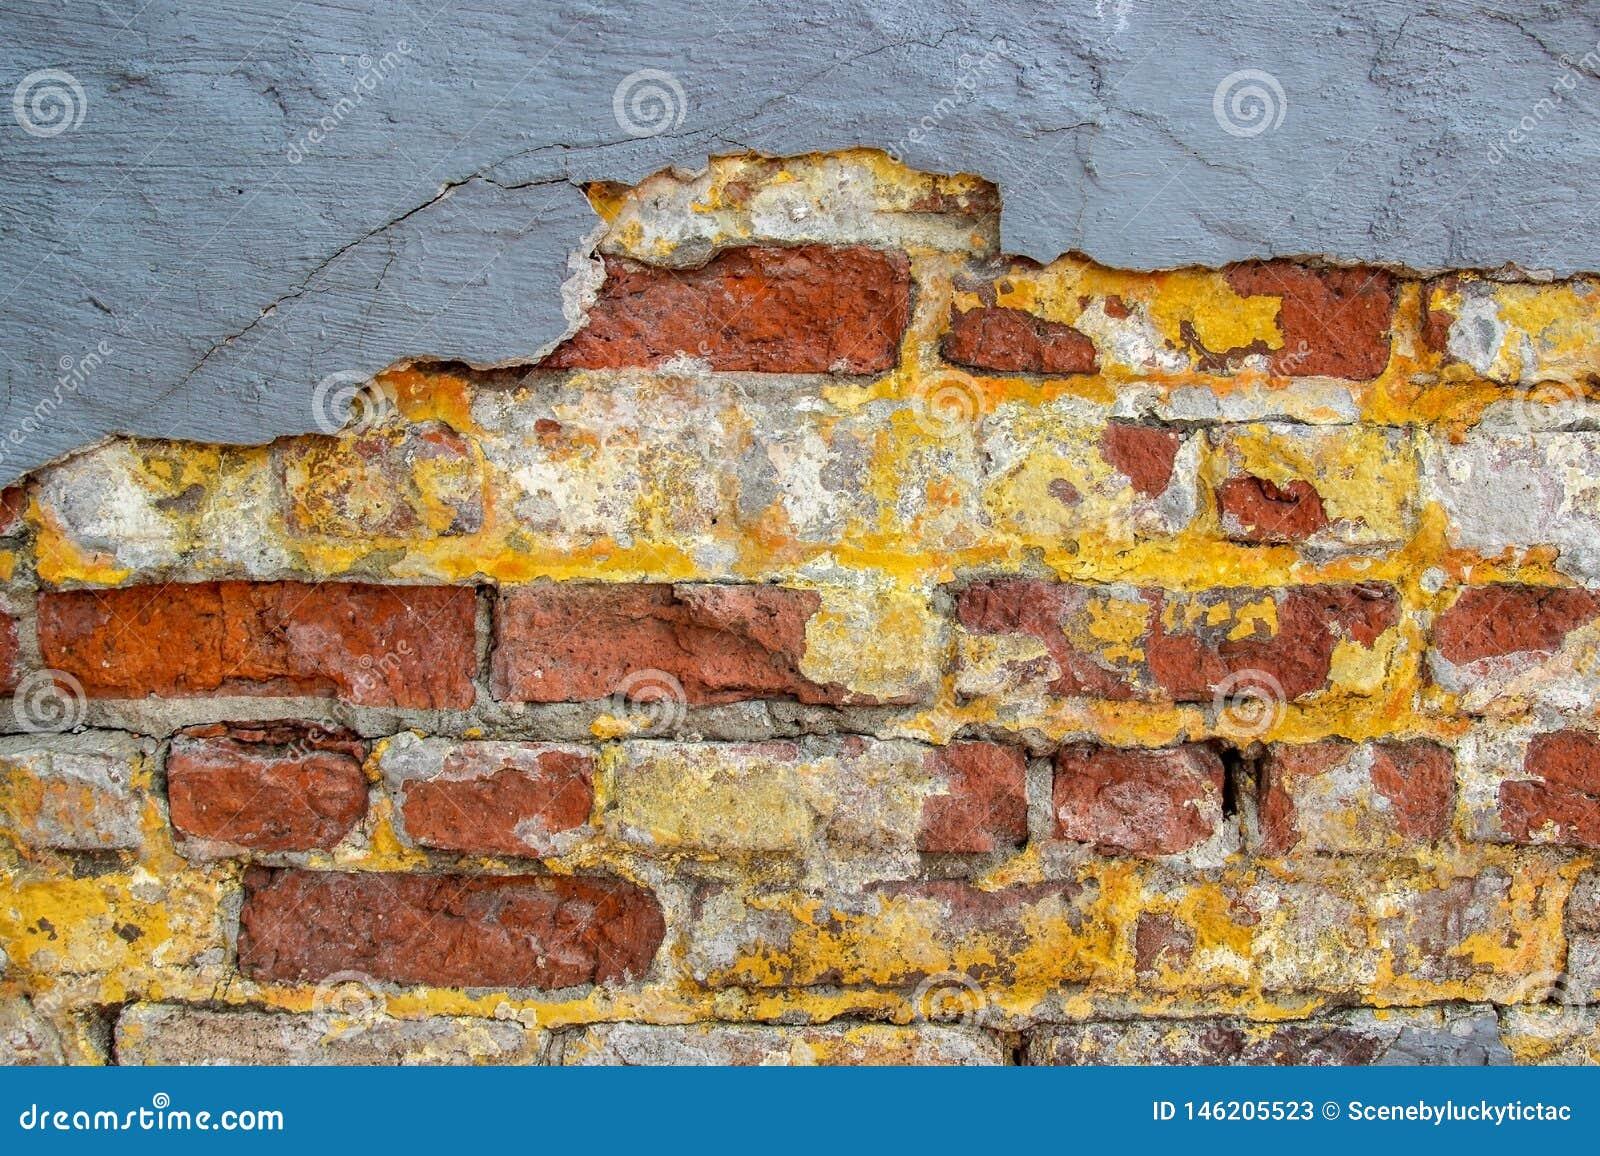 Ashtabula Ohio Red and Yellow Brick Wall